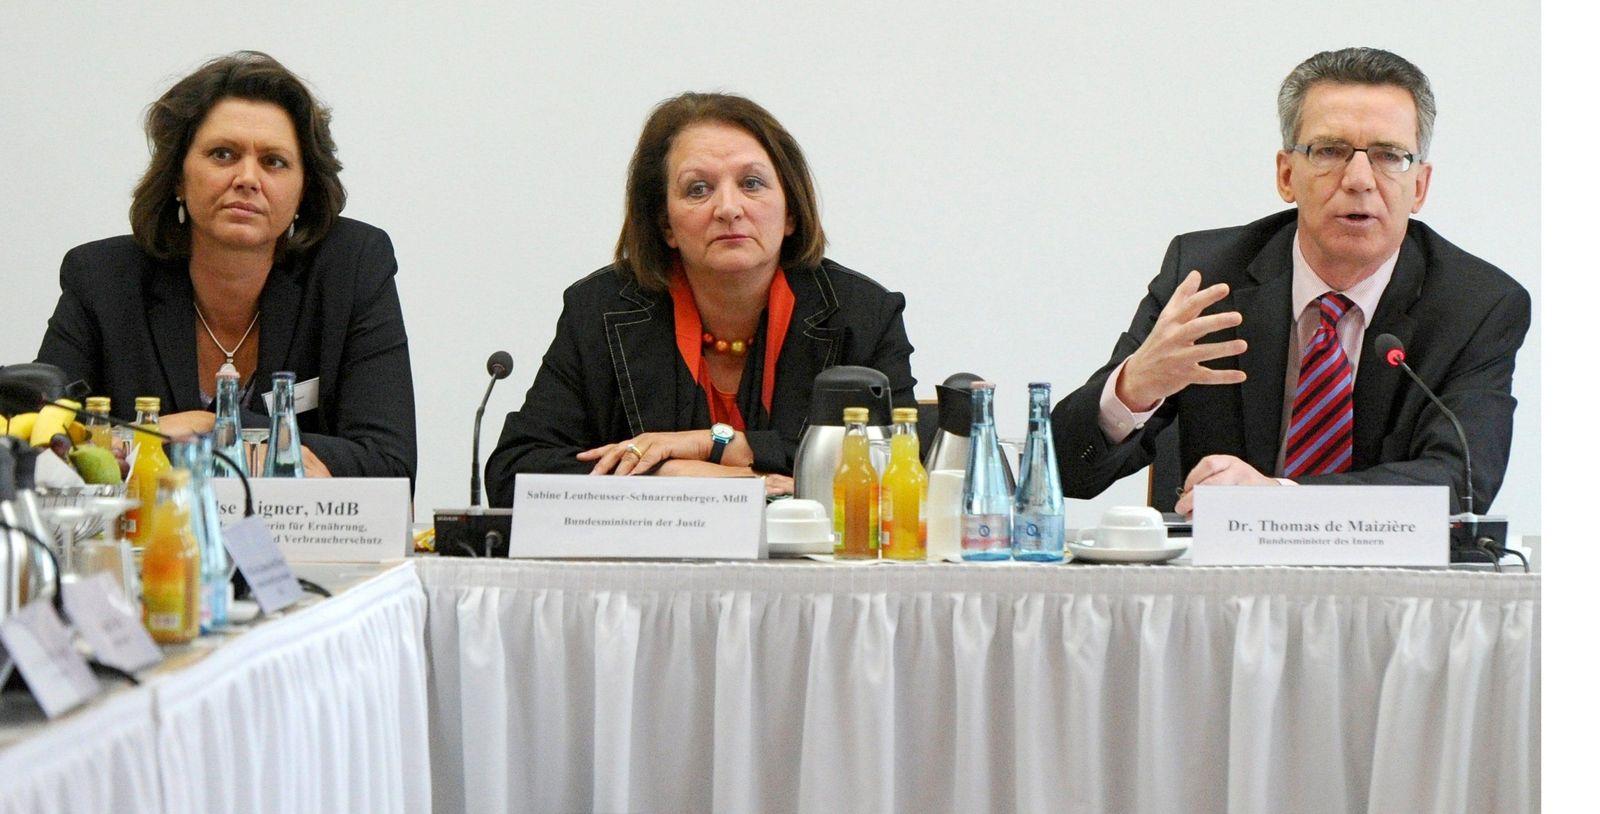 Gipfel / GEO / Online / Aigner / Leutheusser-Schnarrenberger / de Maiziere